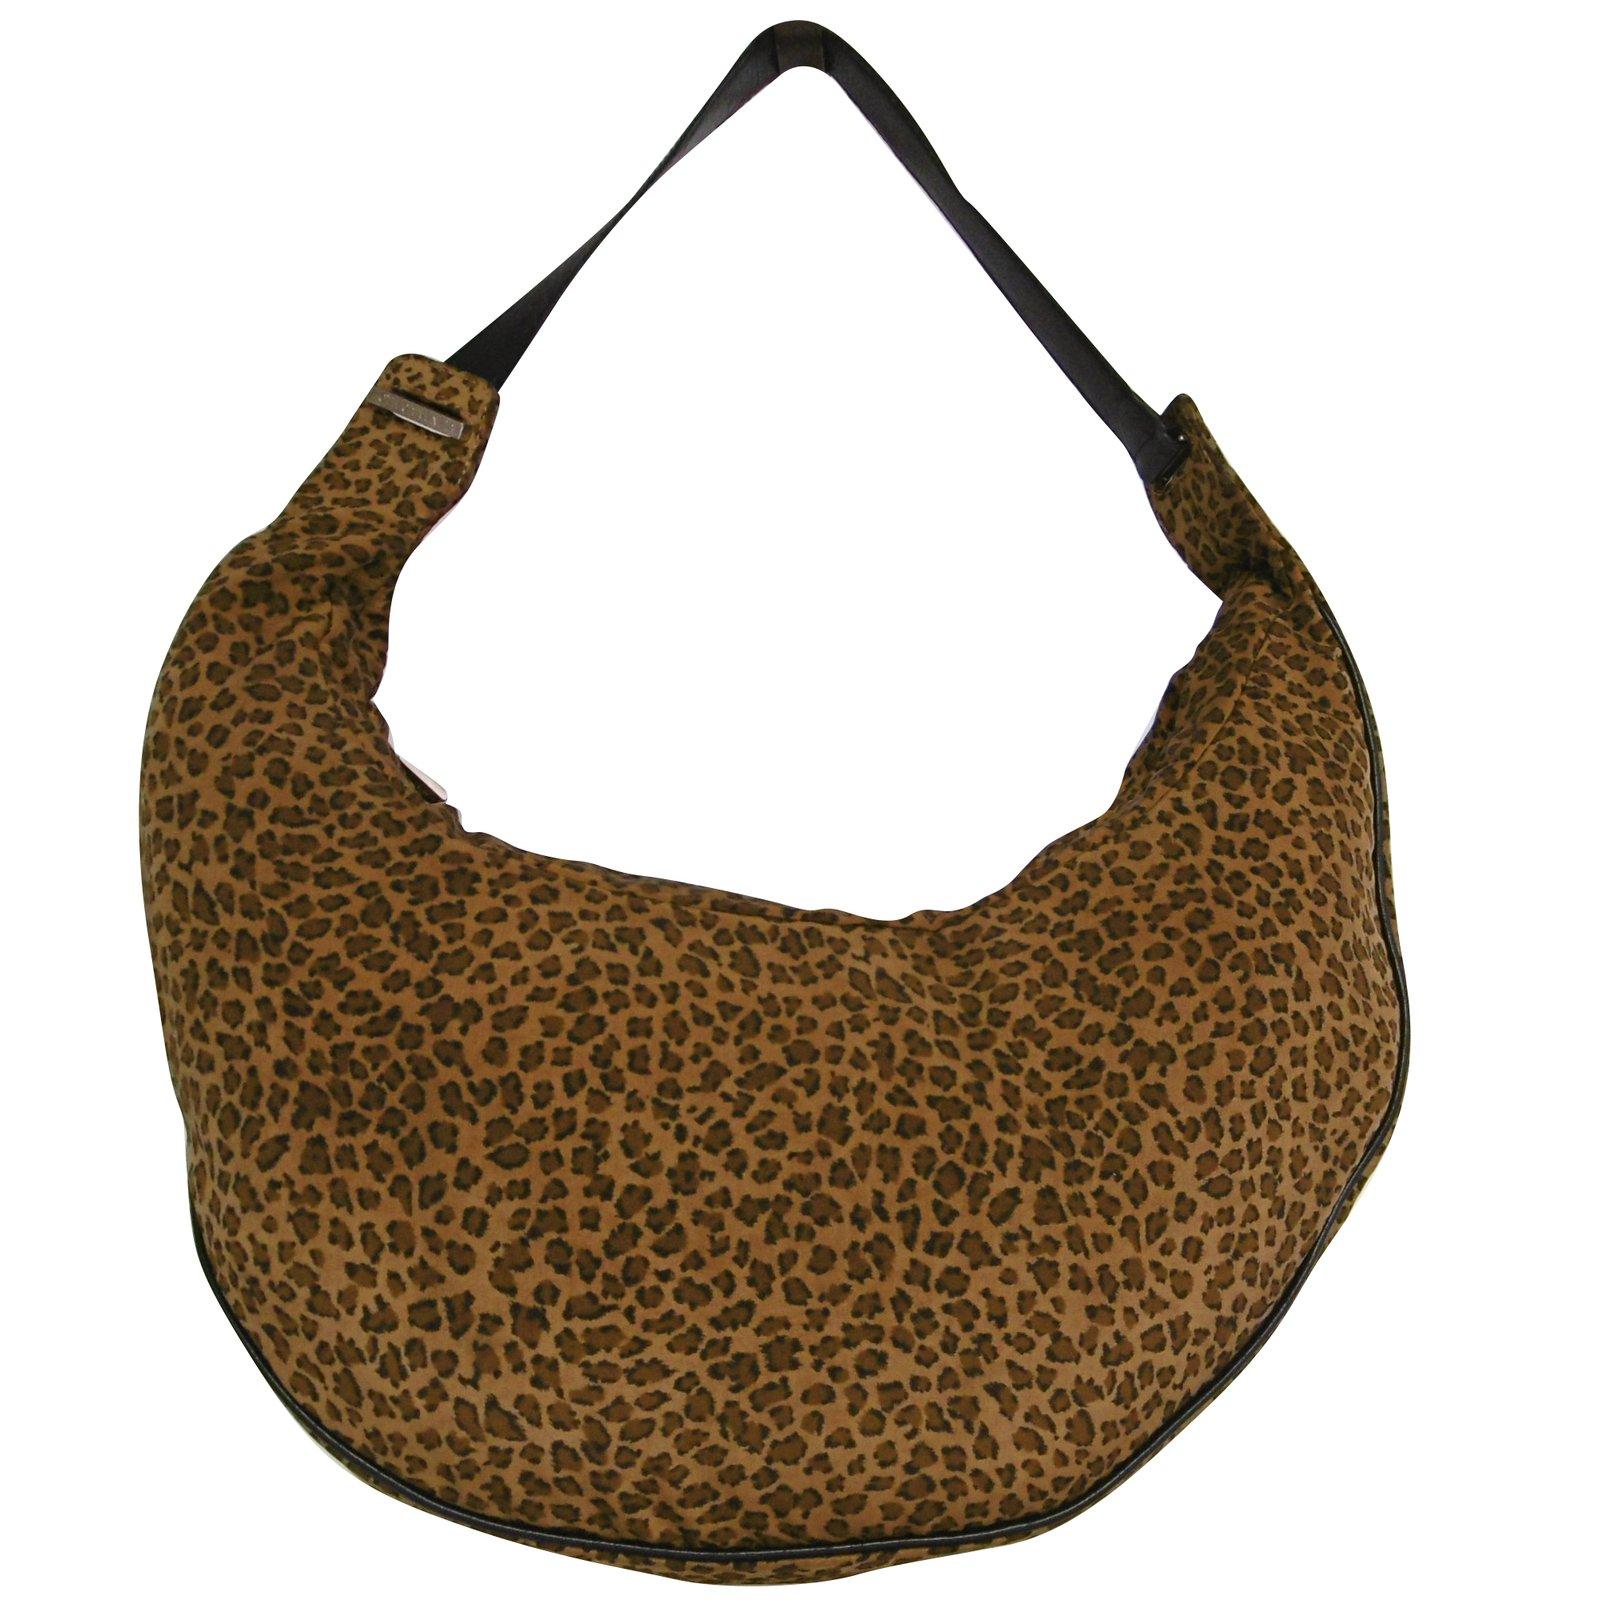 Bottega Veneta Bottega Veneta Leopard Fabric Crescent Shoulder Bag Handbags Leather Cloth Brown Leopard Print Ref 79521 Joli Closet